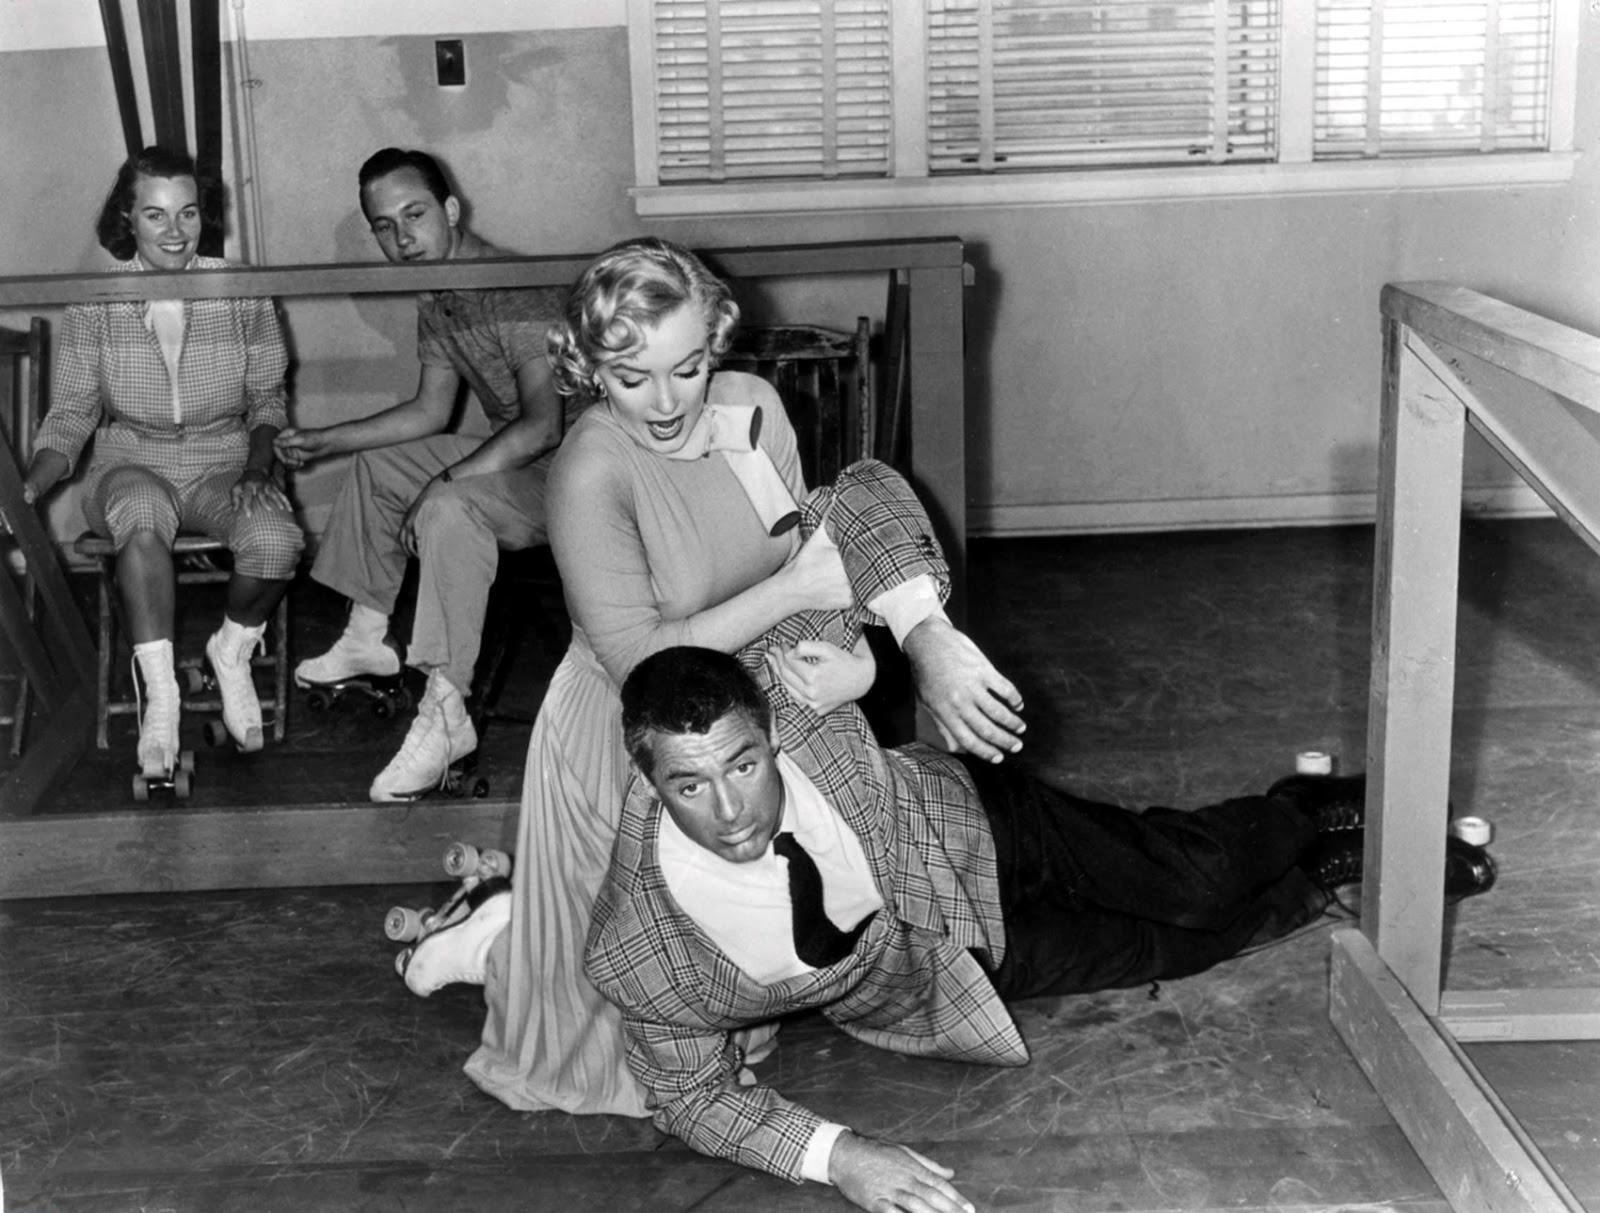 Crime Scene Photos Of Marilyn Monroe Marilyn monroe and cary grant